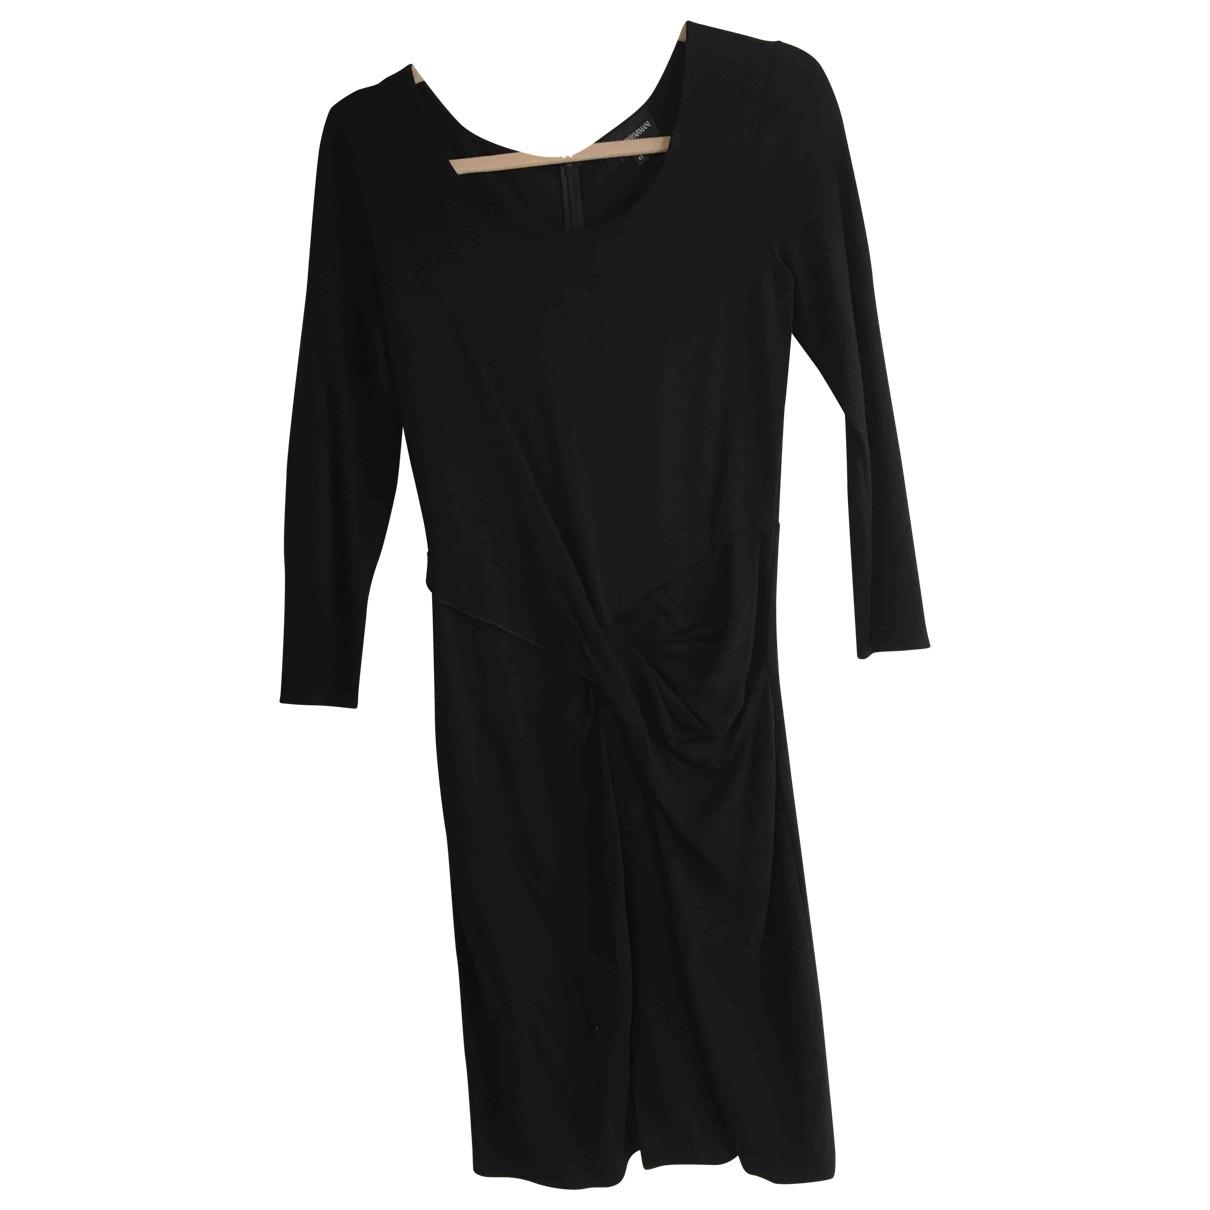 Emporio Armani \N Kleid in  Schwarz Baumwolle - Elasthan